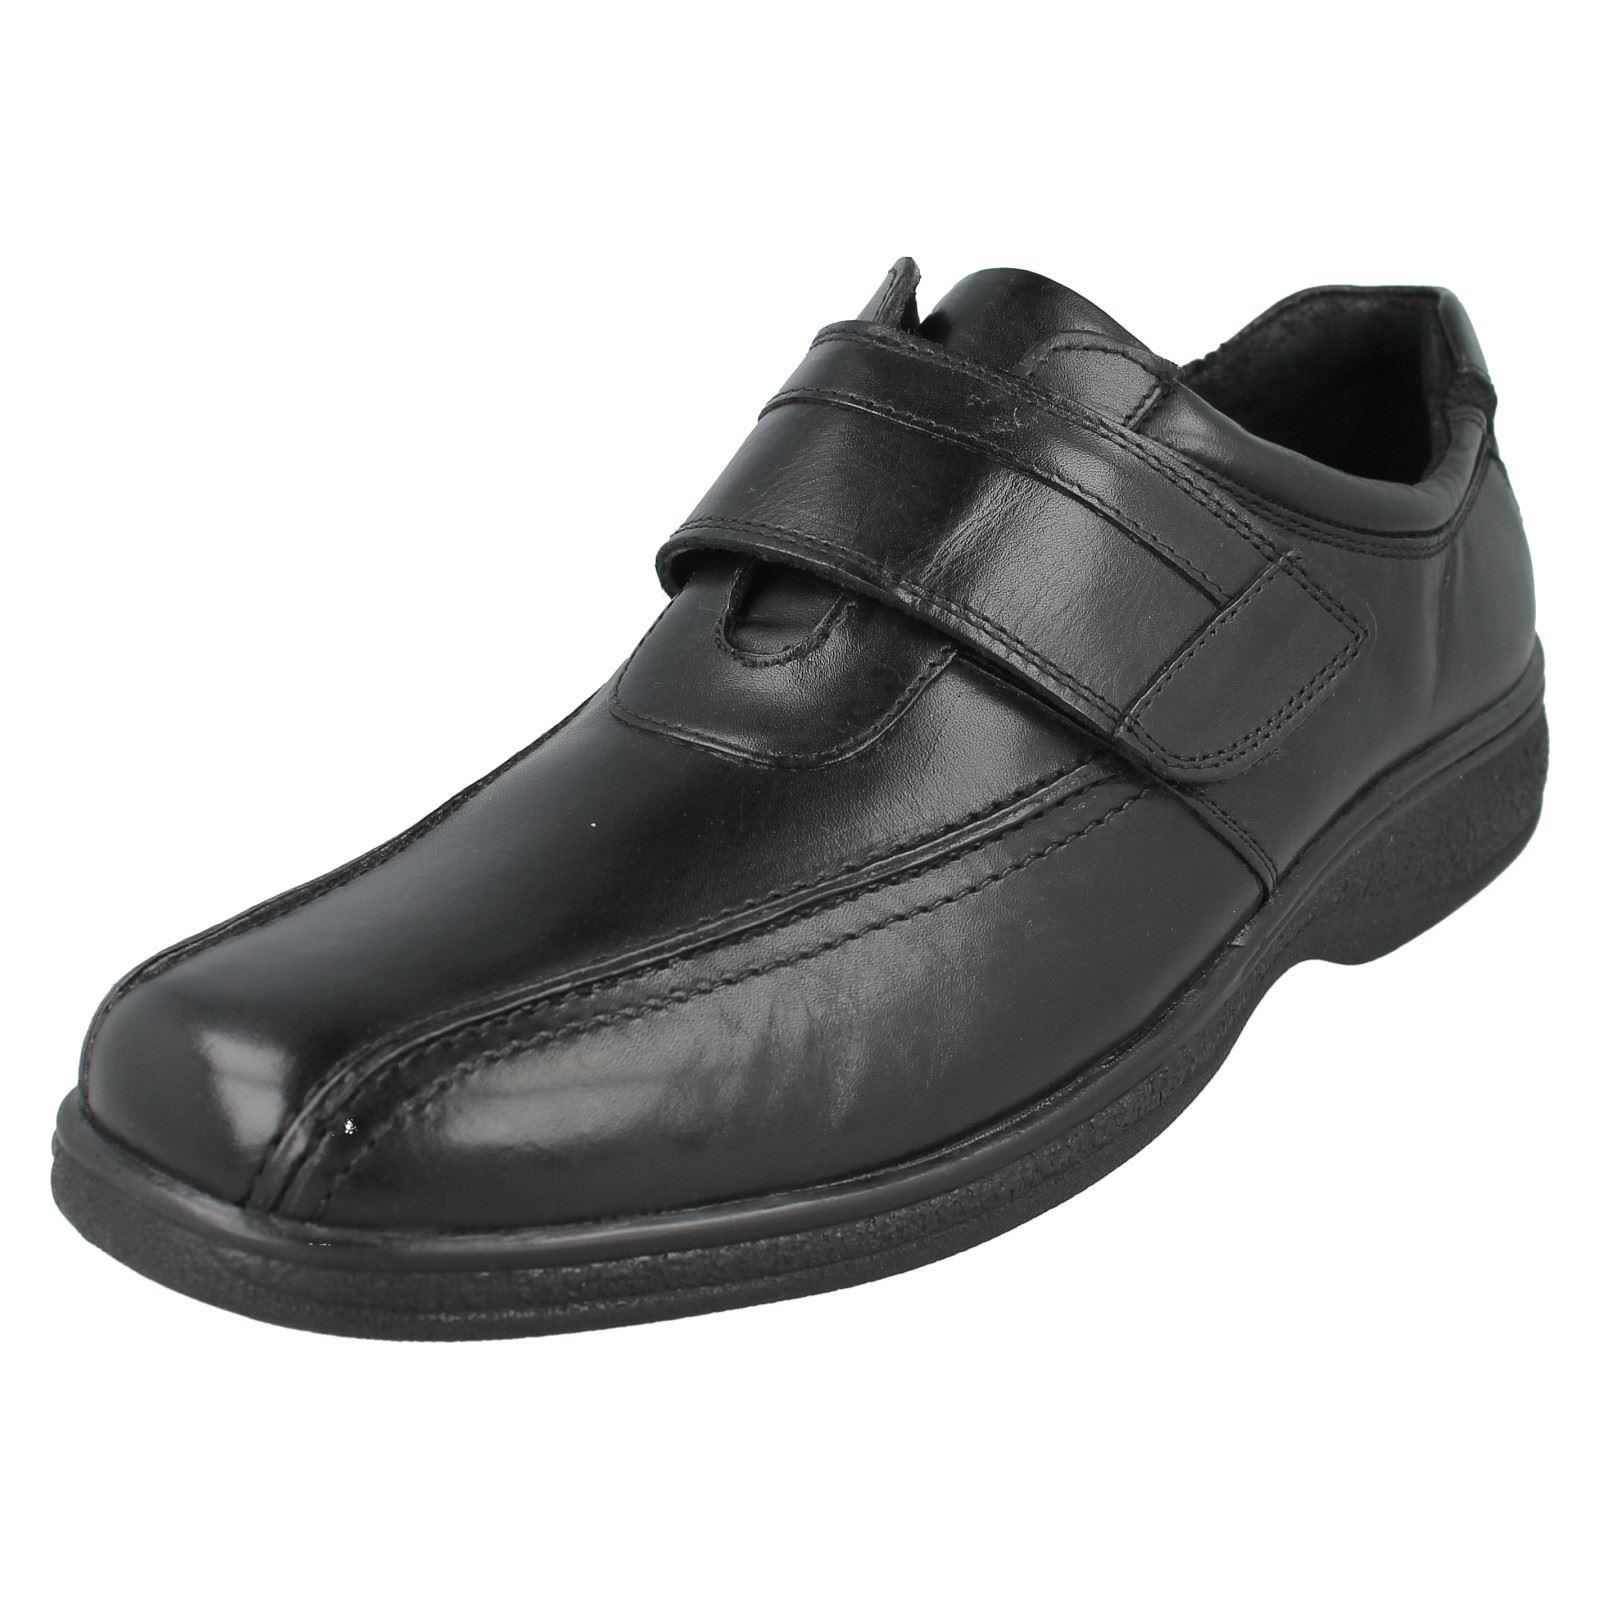 Hombre-Hush-Puppies-Zapatos-THE-STYLE-bourton-IDEA